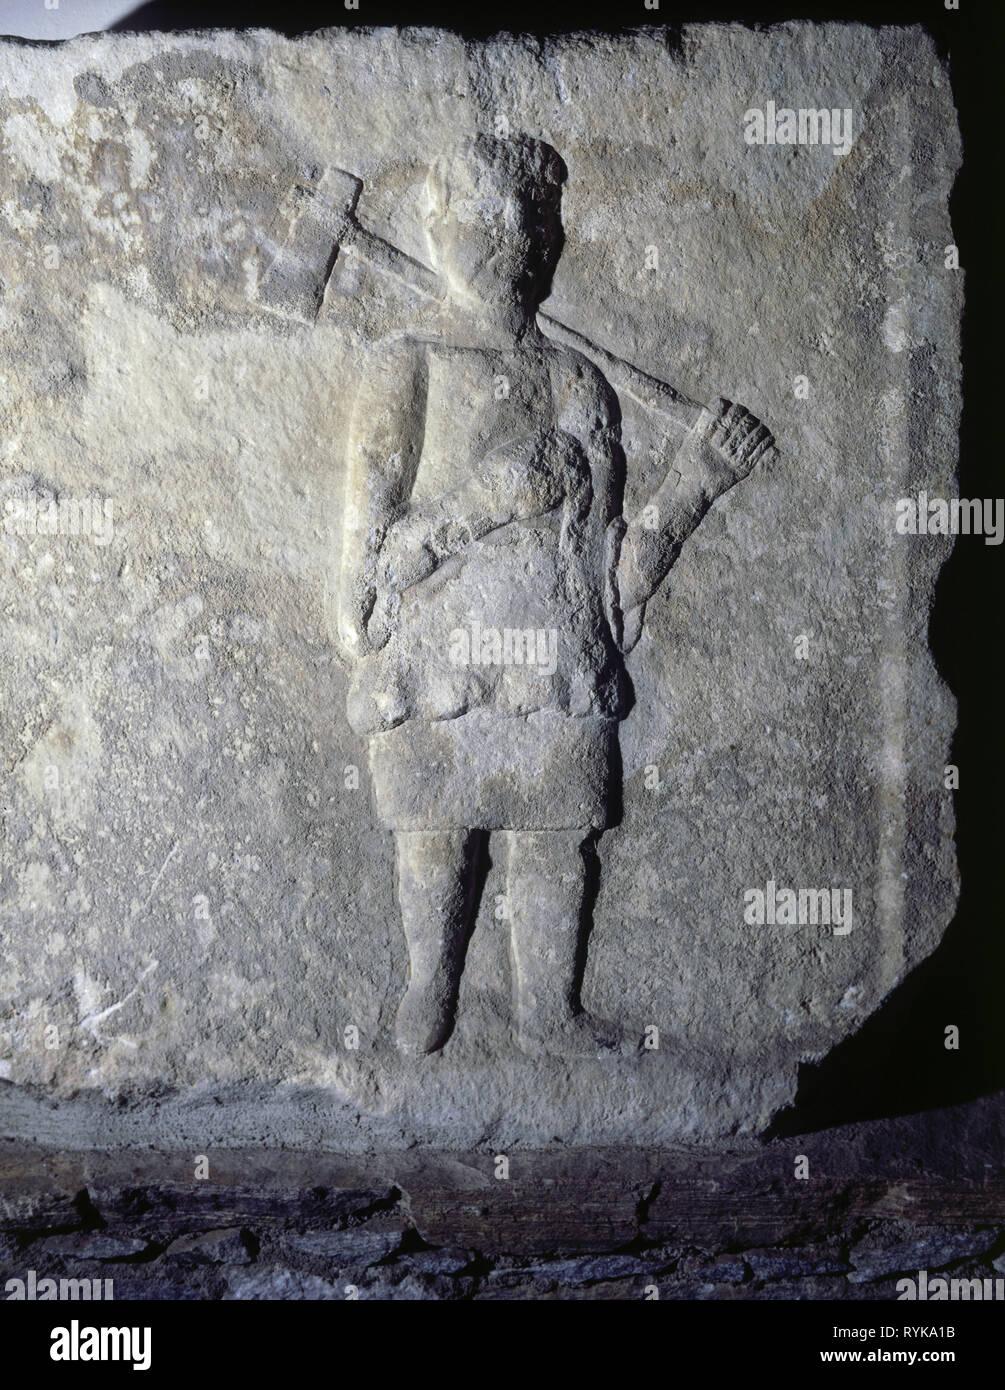 antike romische reich entlastung der landwirt oder handwerker teurnia karnten osterreich additional rights clearance info not available